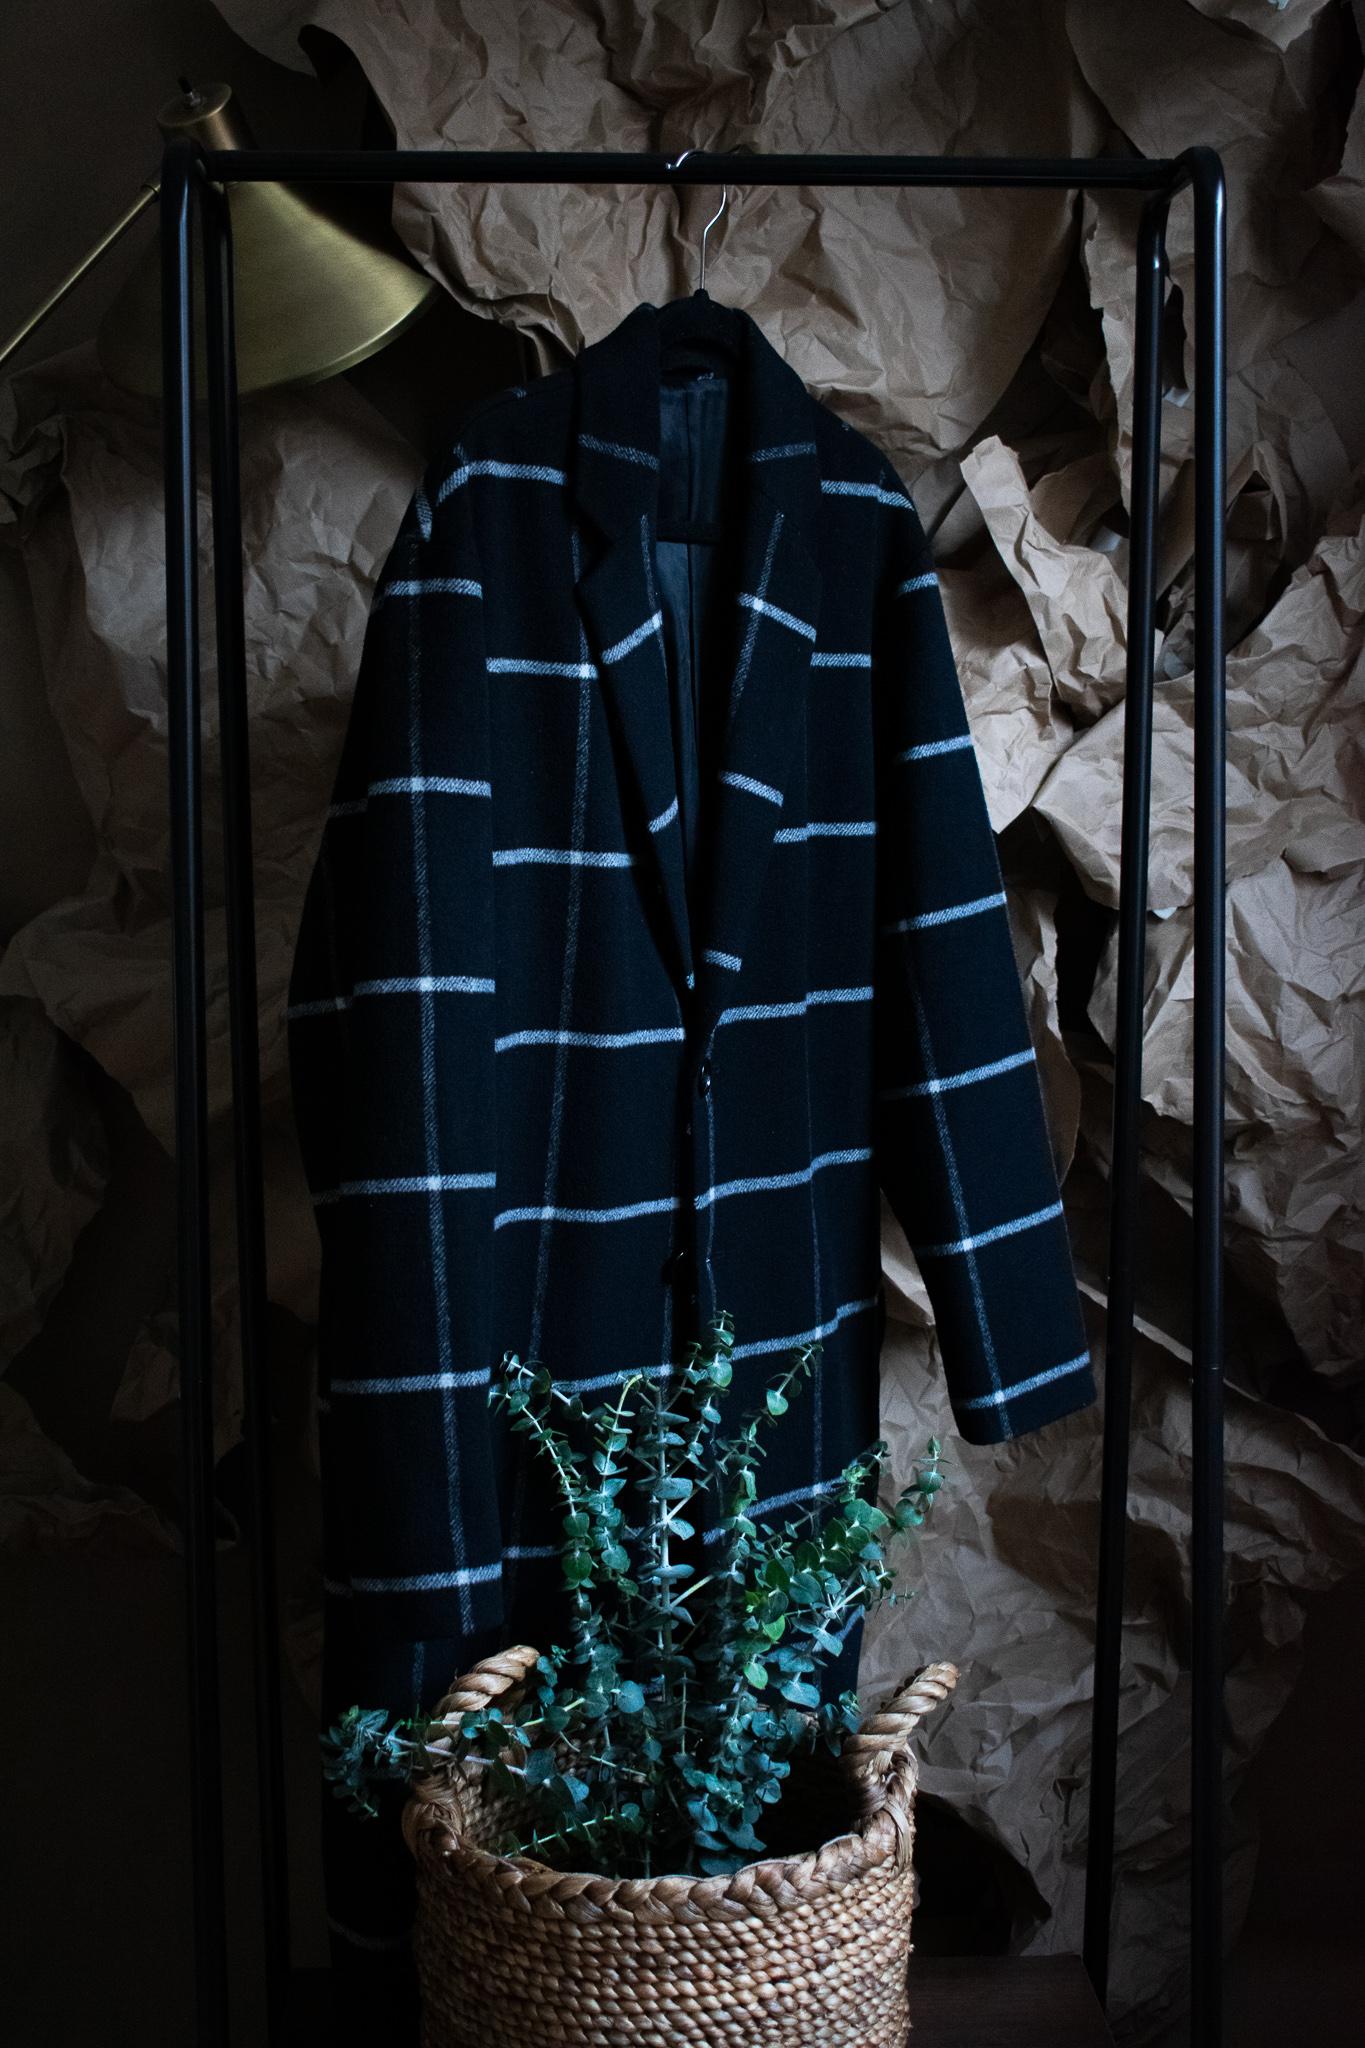 river island coat. 4 years. $200. good as new.